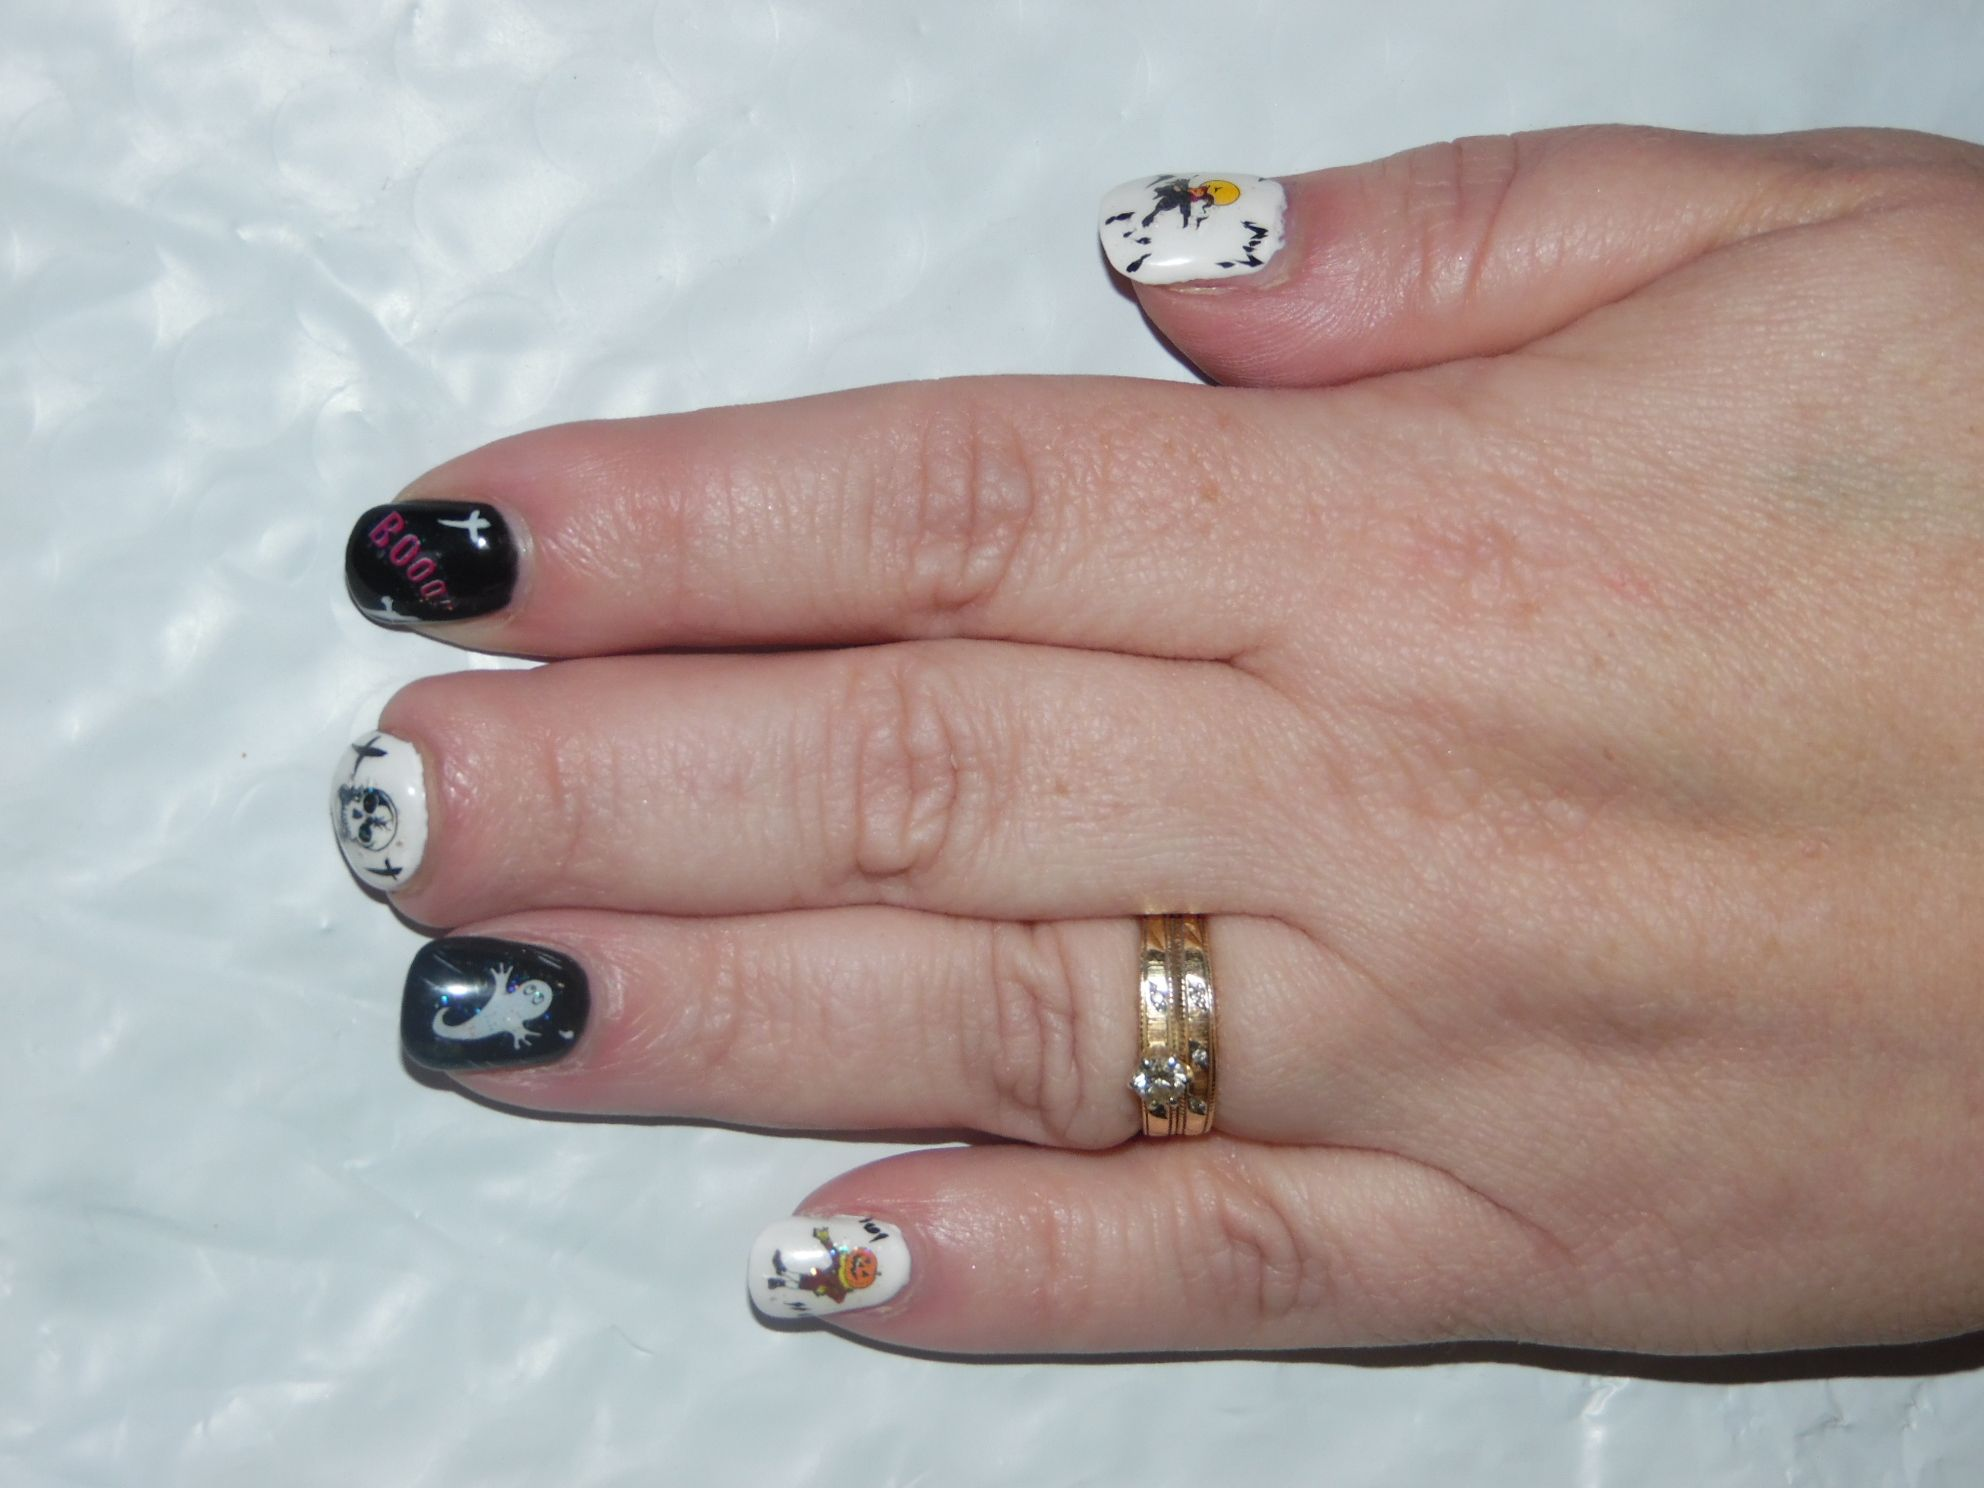 my halloween manicure, donelana at glamorous nails in beaverton